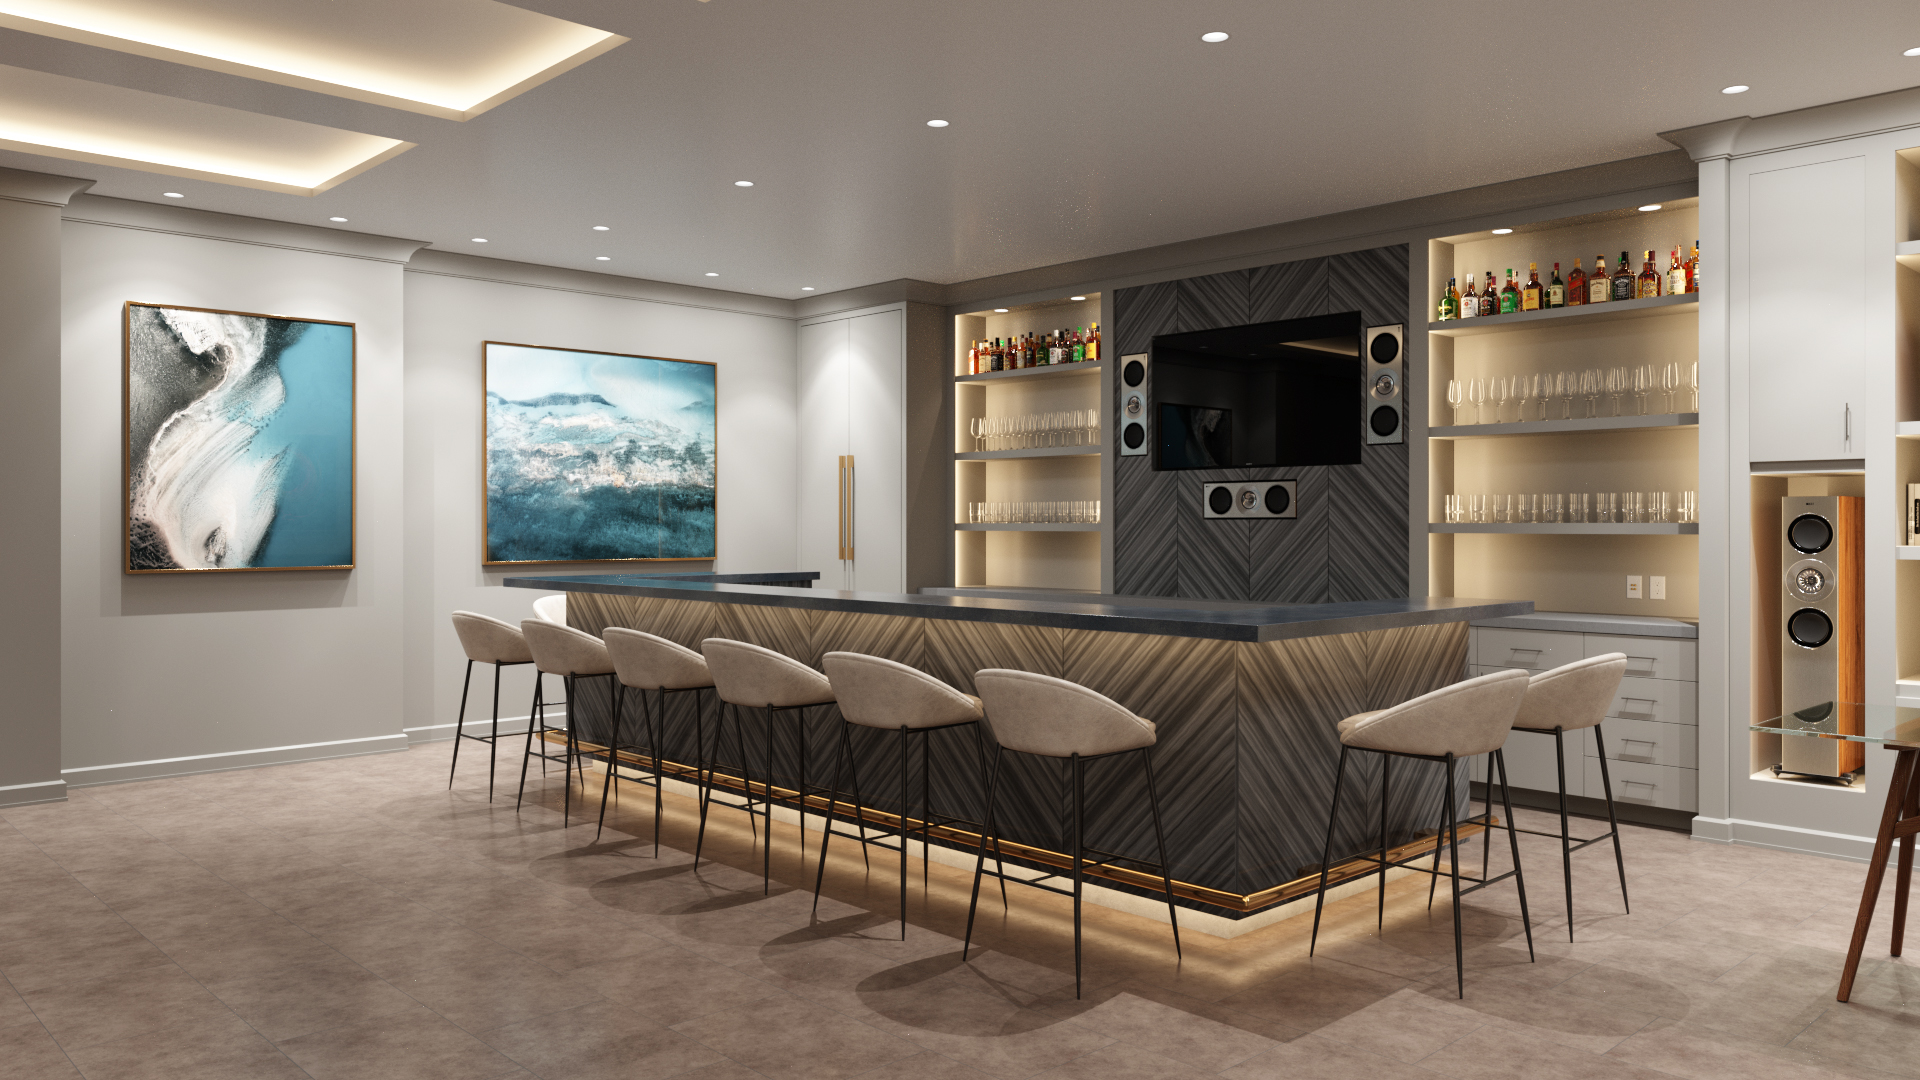 19044205-KEF Virtual Music Lounge_Interior Still_Final_Bar